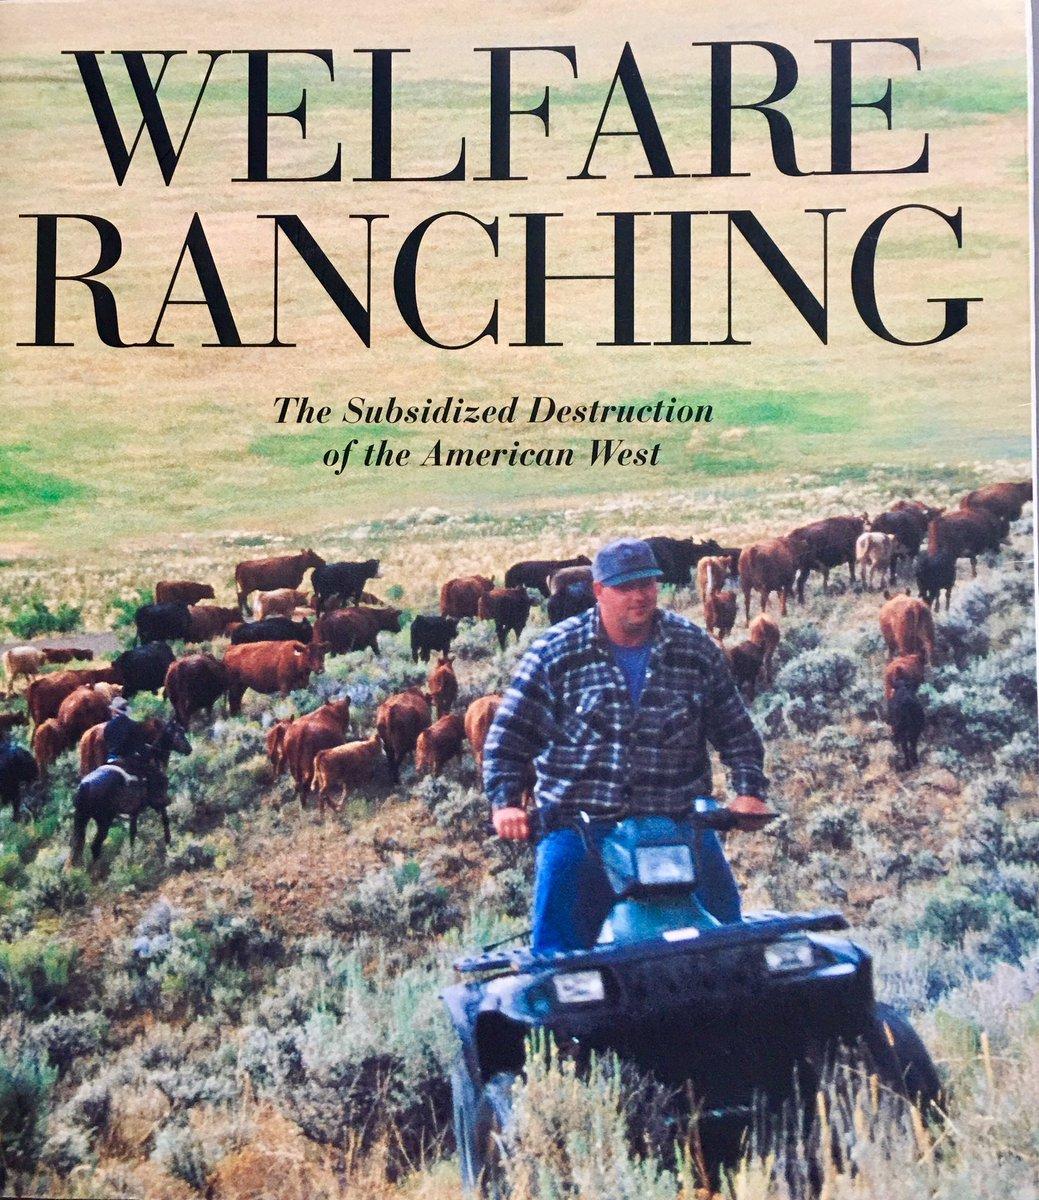 Entitled #welfareranchers r a YUGE burden on our #publiclands, wildlife, #wildhorses. #BuyEmOut. MoooveEmOn! @MartinHeinrich @rollcall @BBC<br>http://pic.twitter.com/BdYb7cBWV5